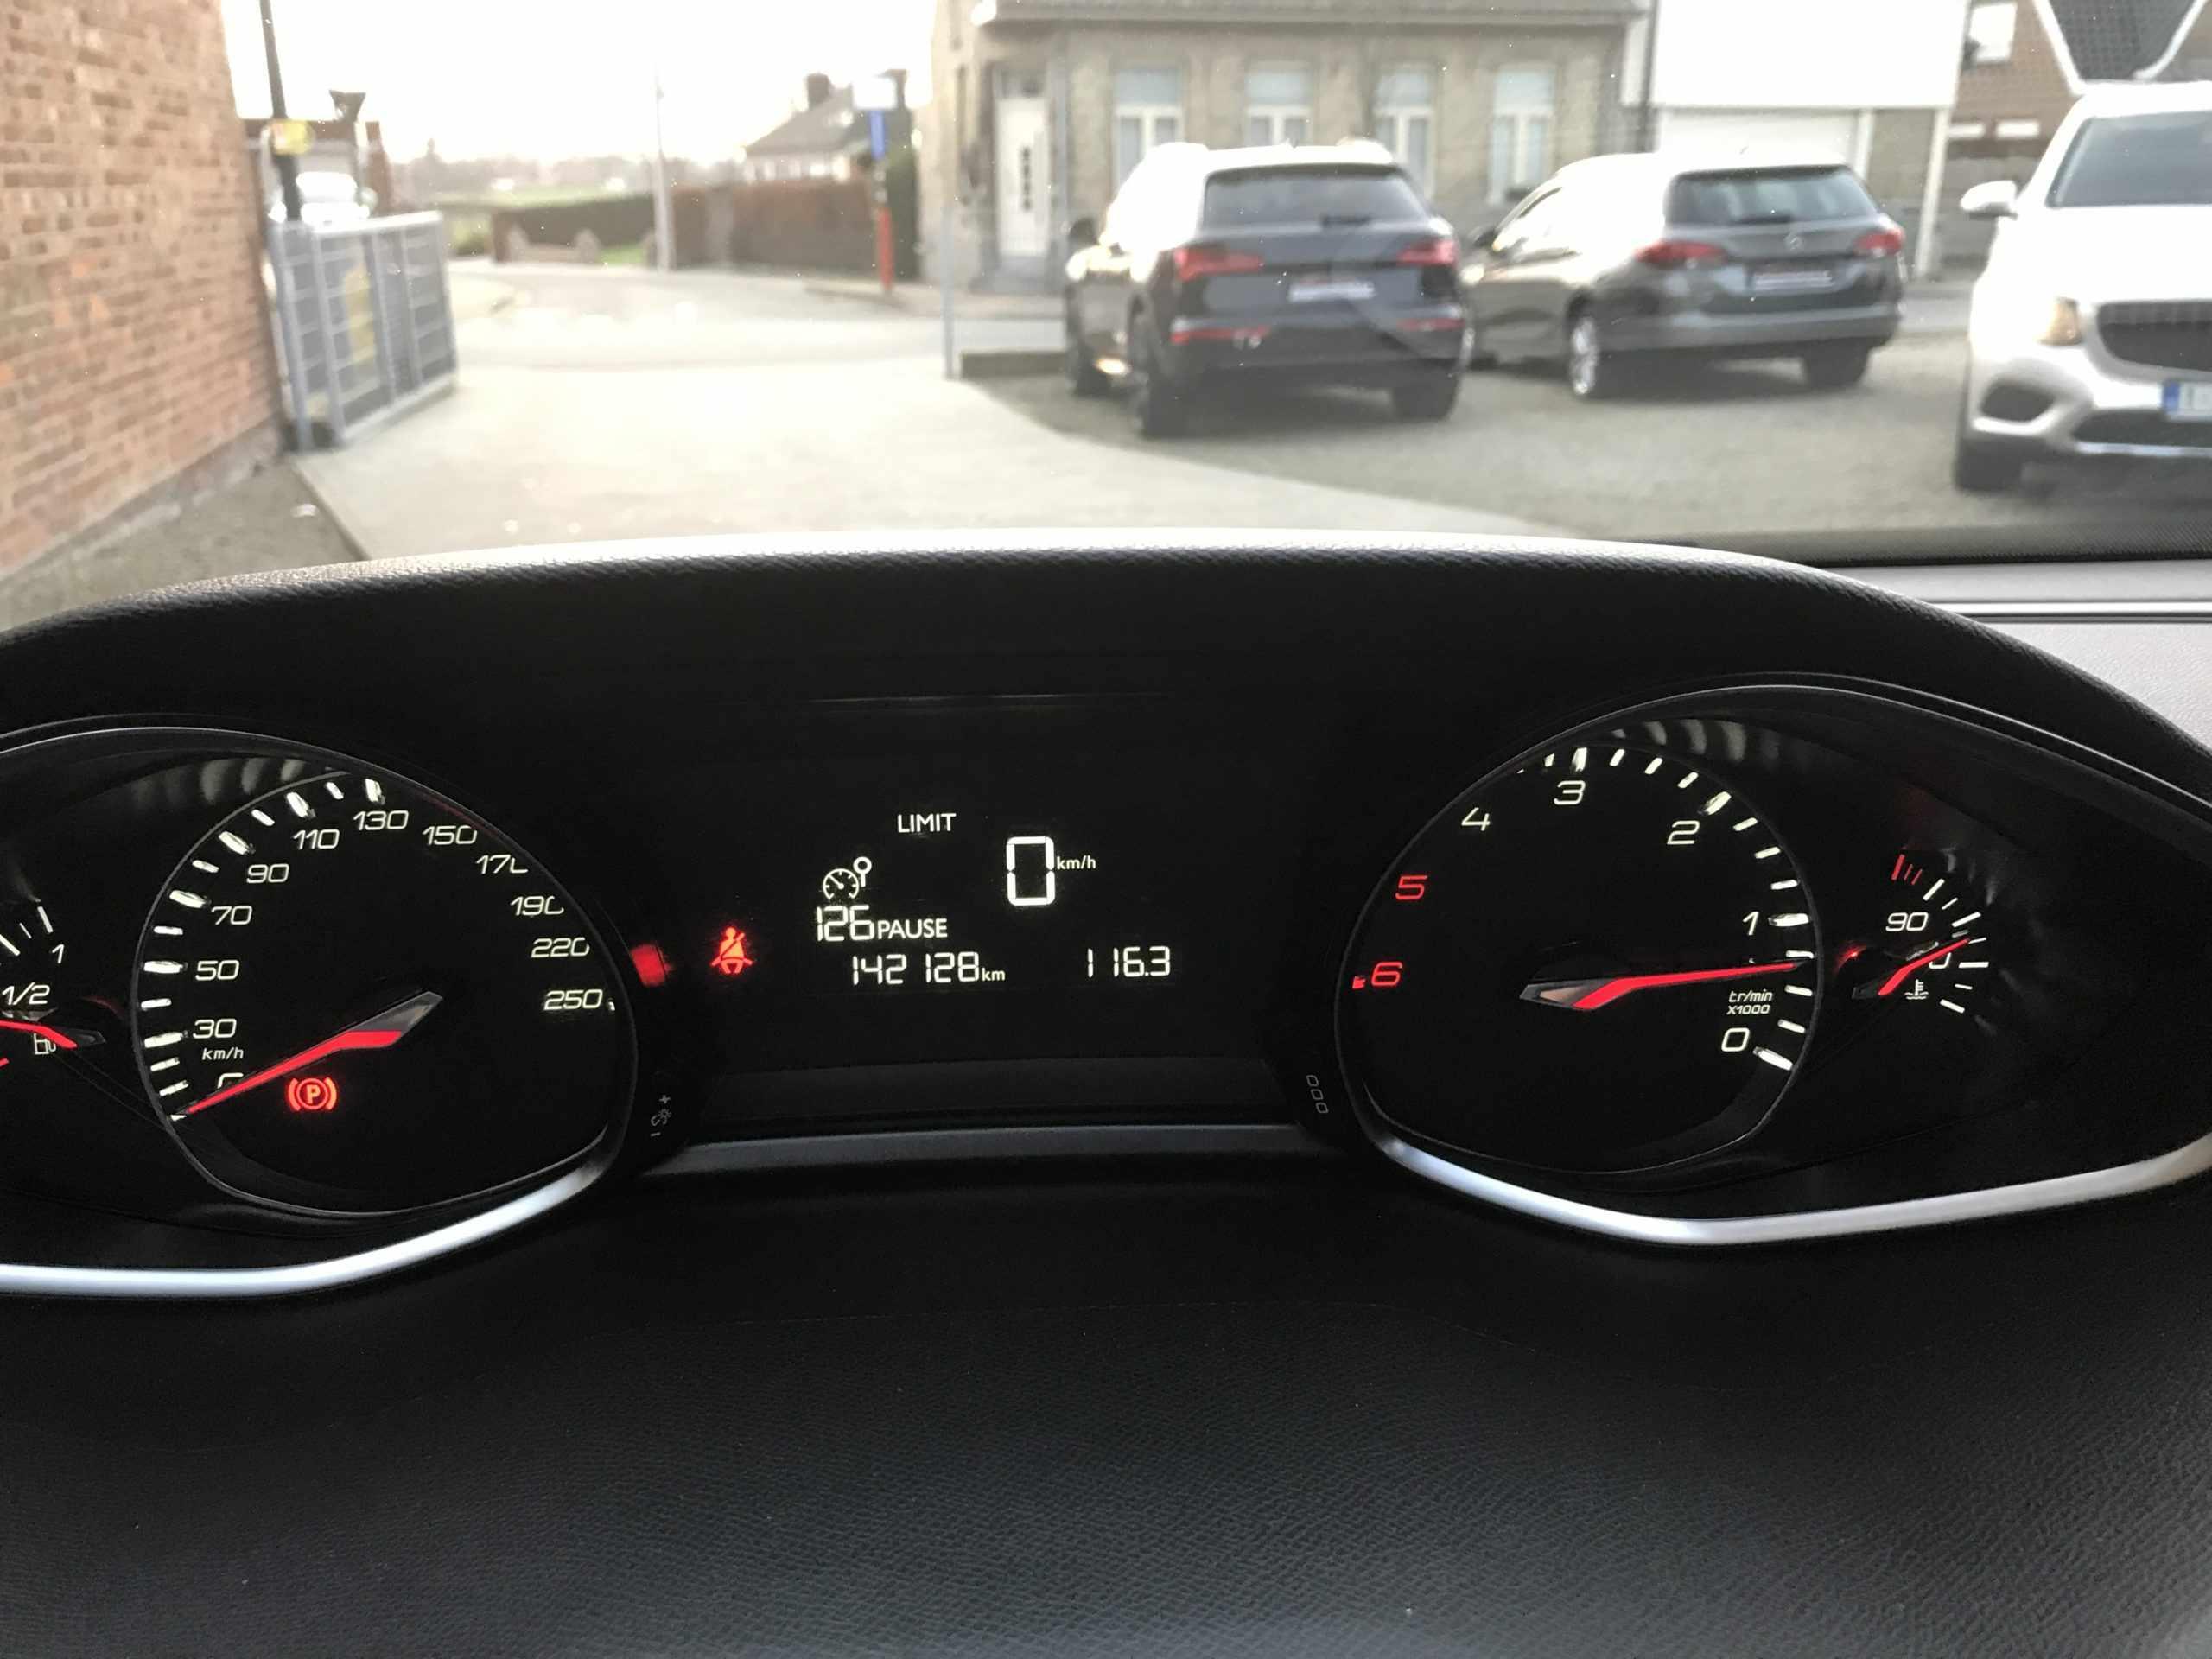 Peugeot 308 hdi allure met garantie!!